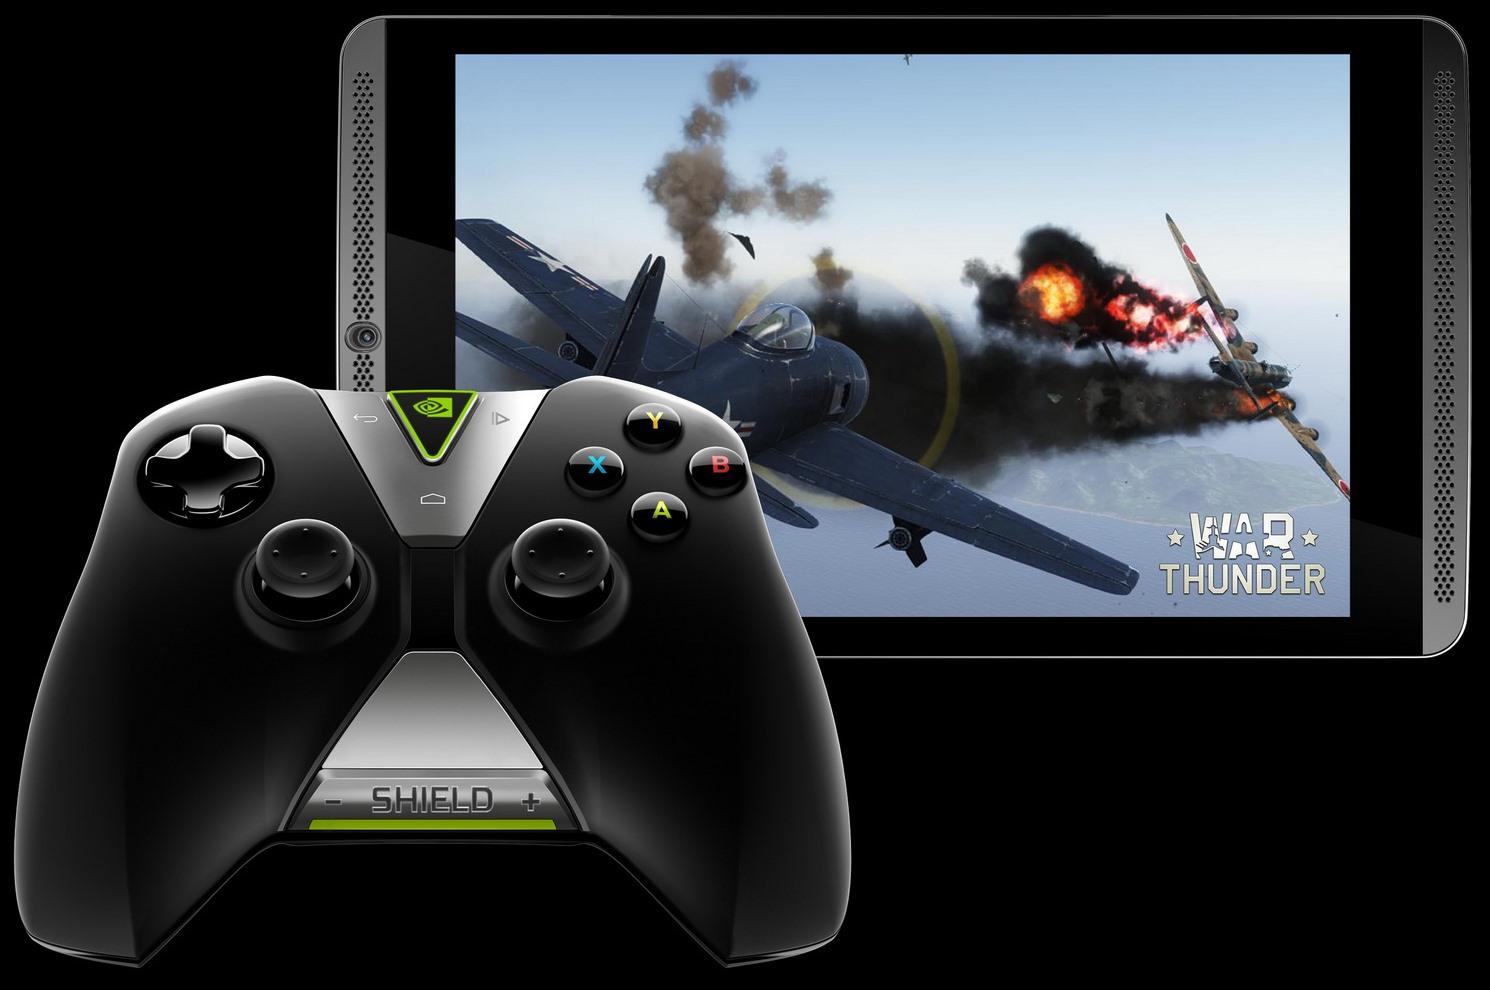 SHIELD Tablet + WC - War Thunder